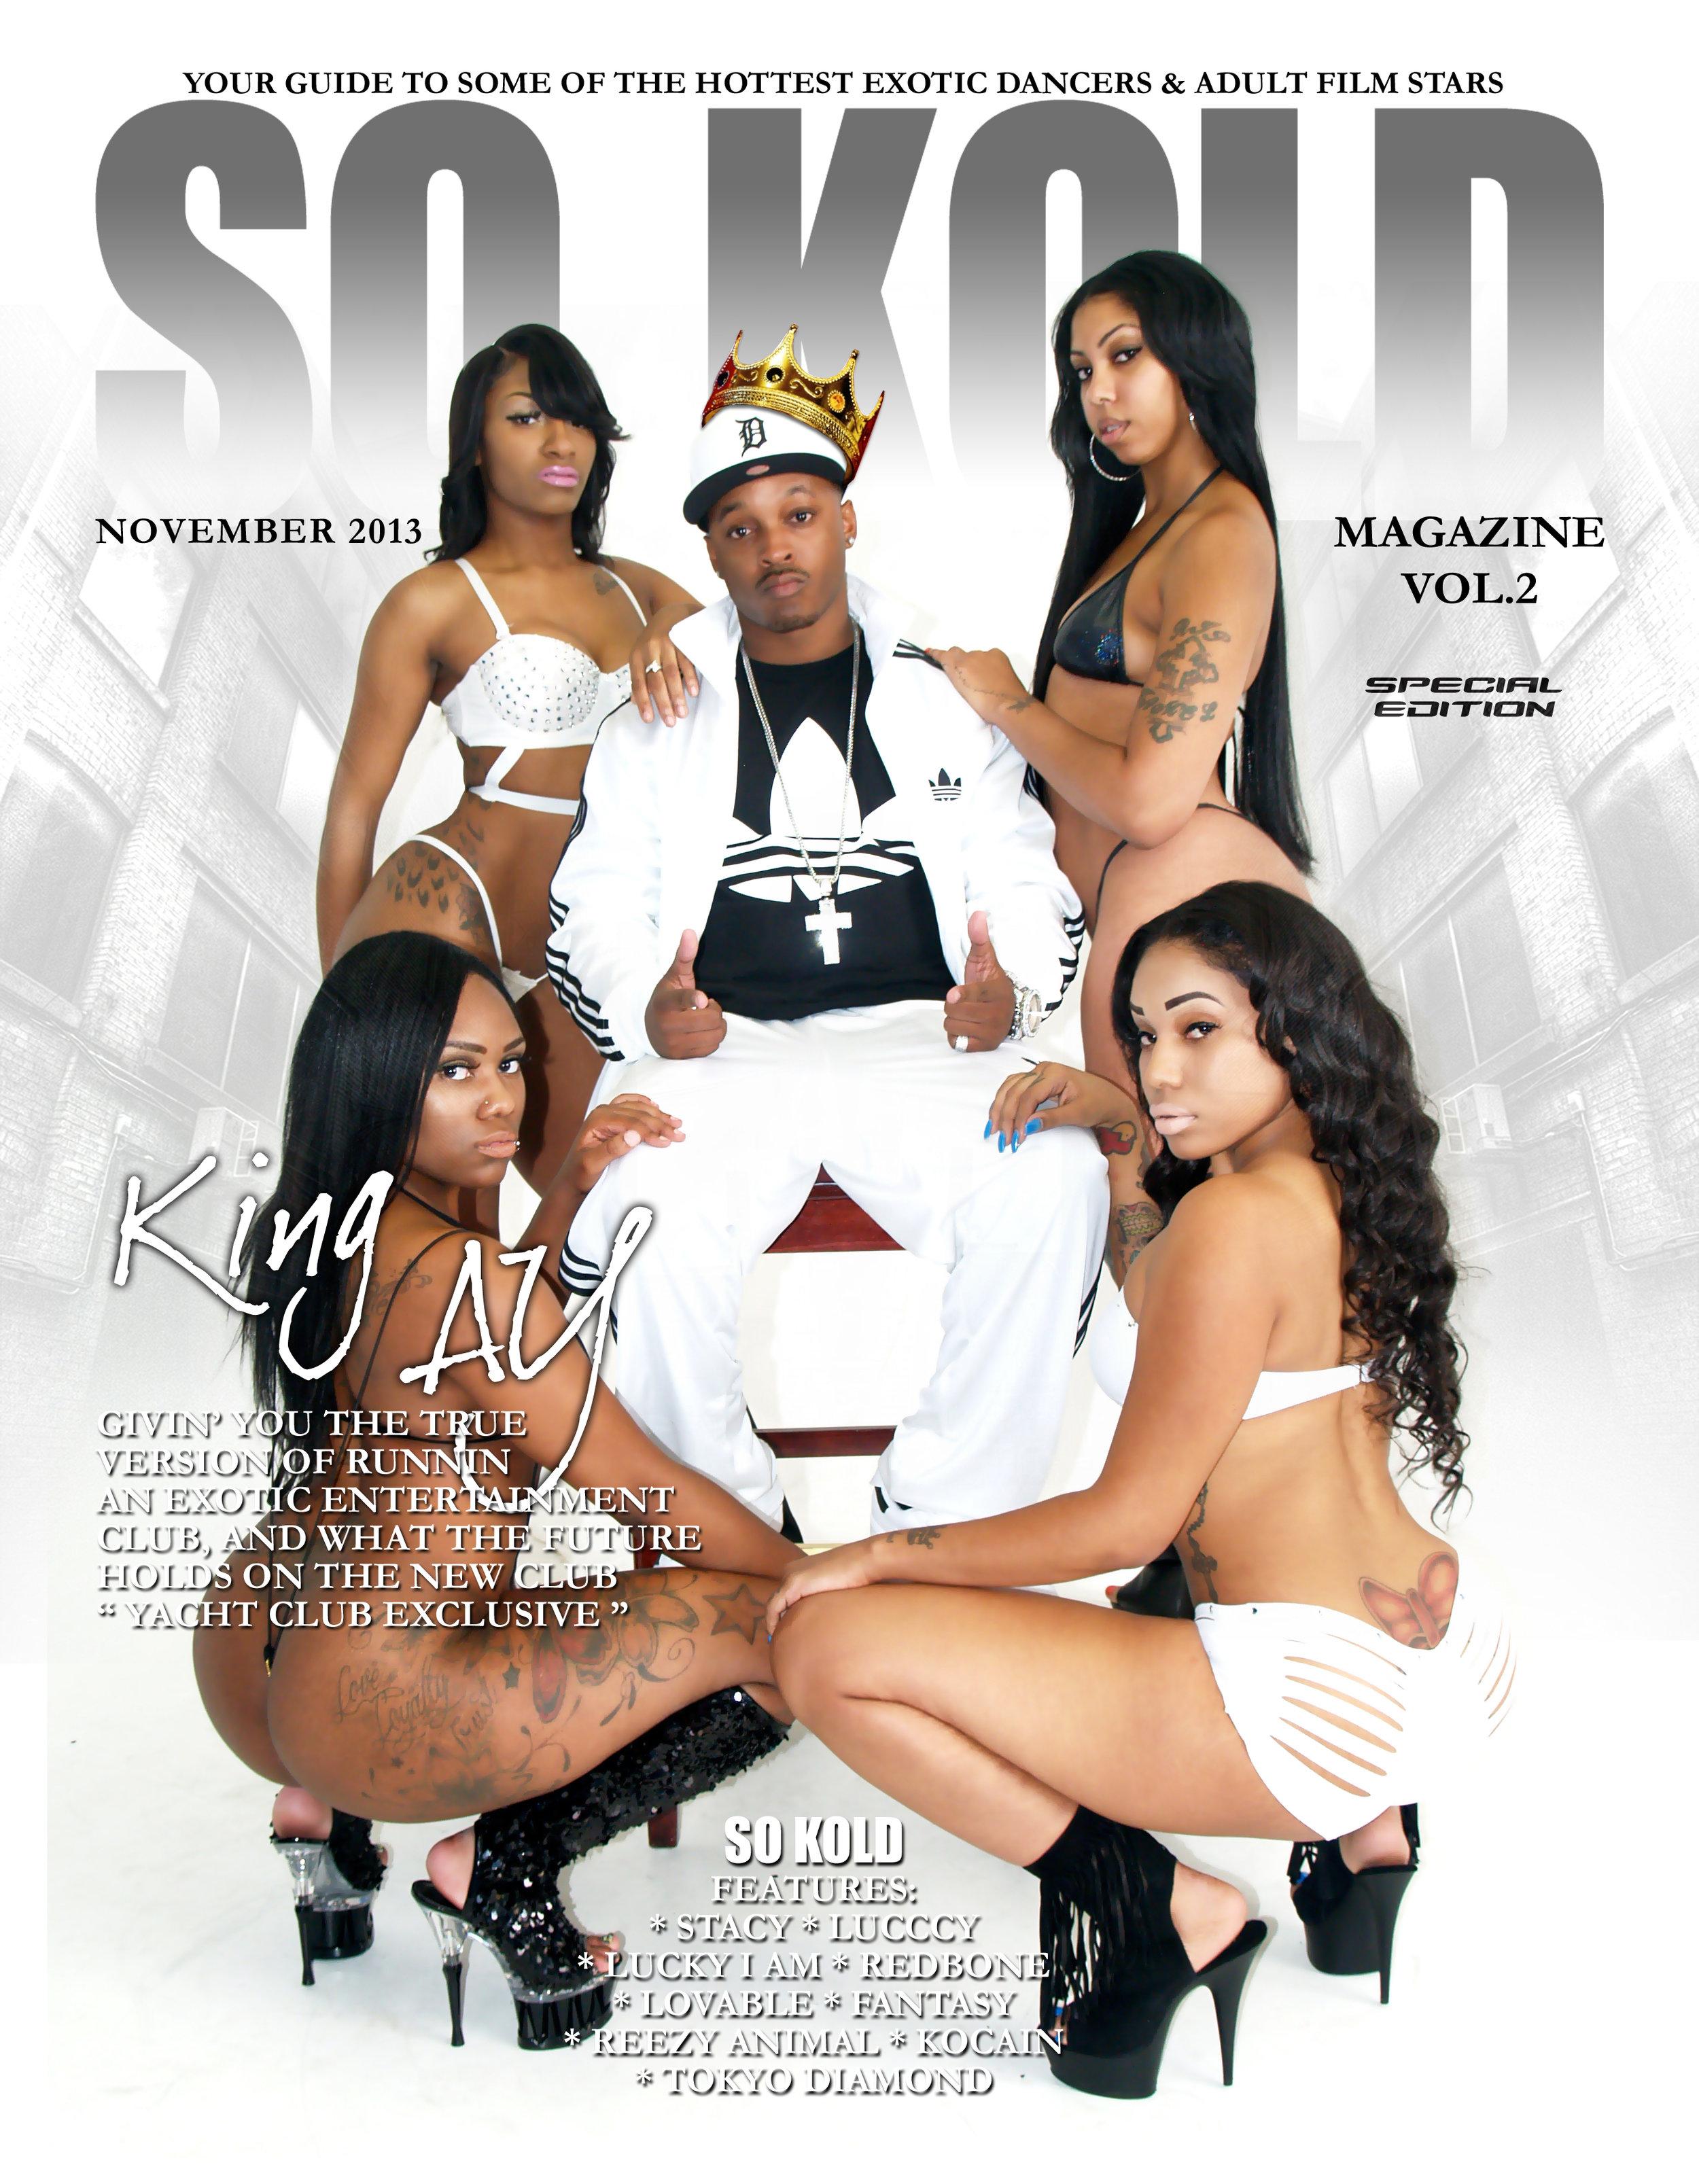 COVER2 2013 copy.jpg